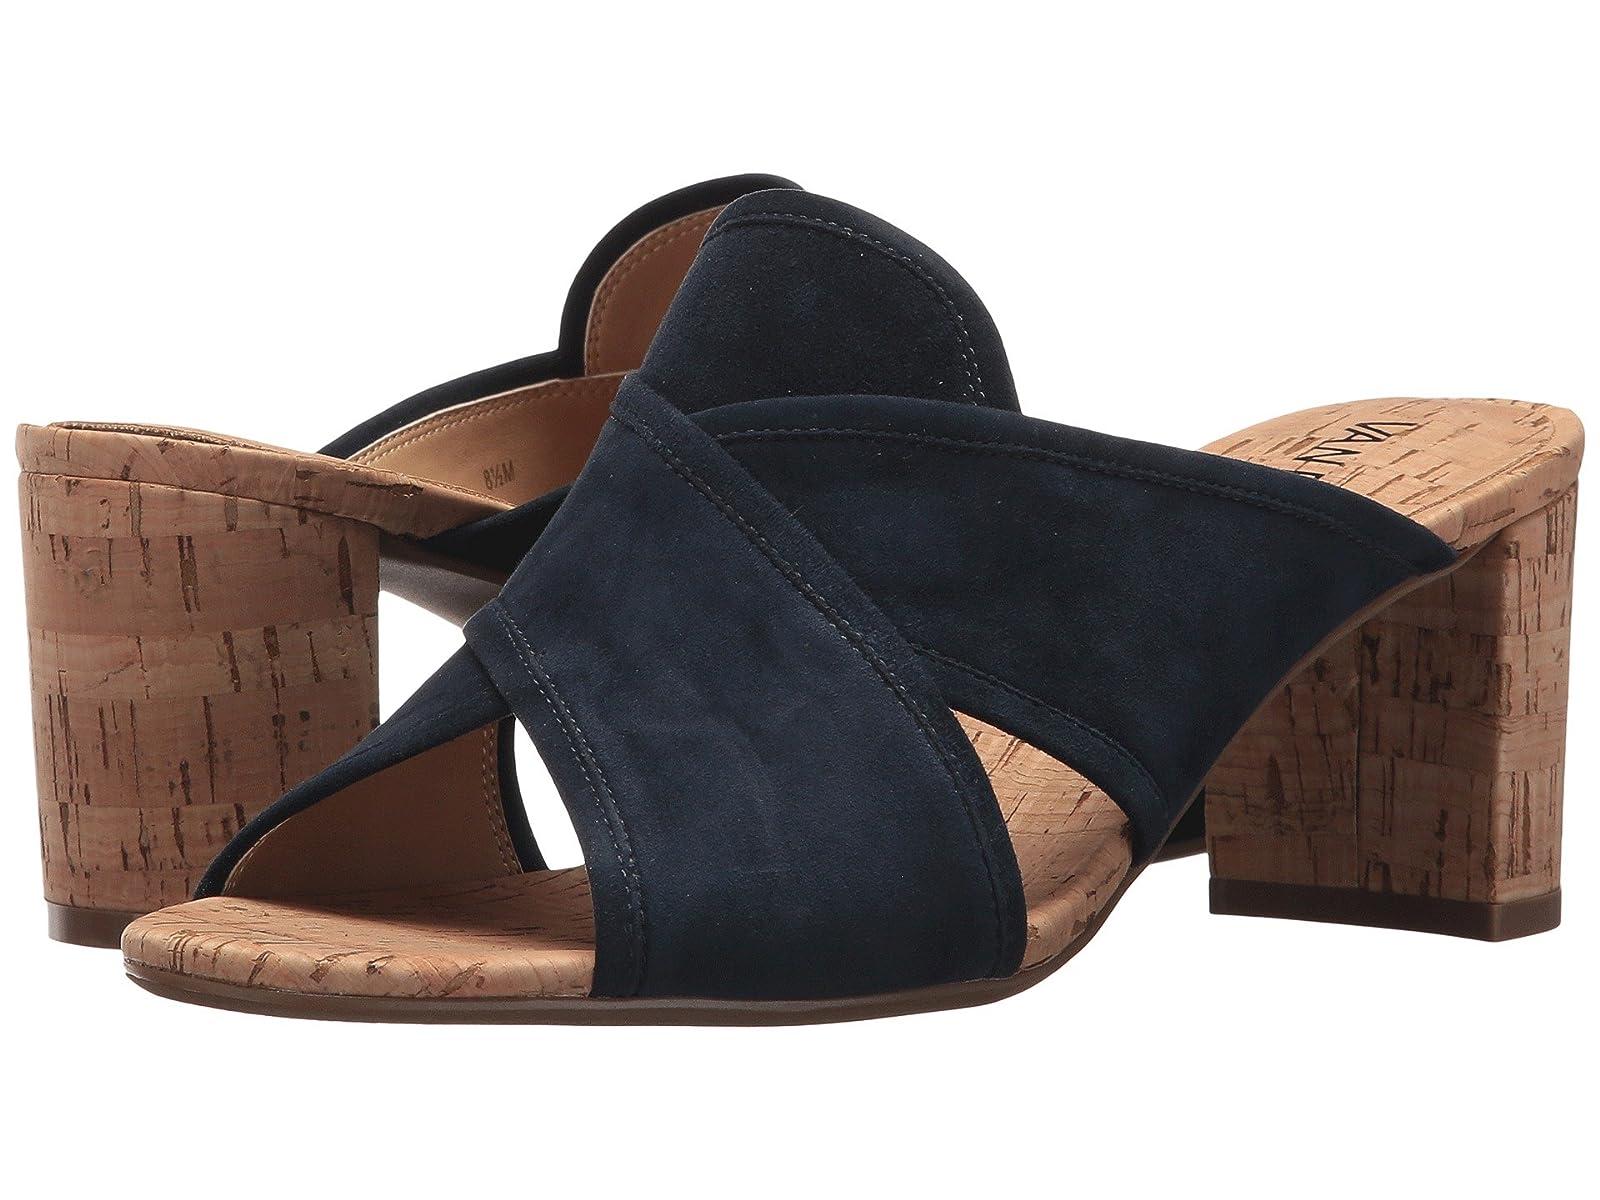 Vaneli MeranaCheap and distinctive eye-catching shoes